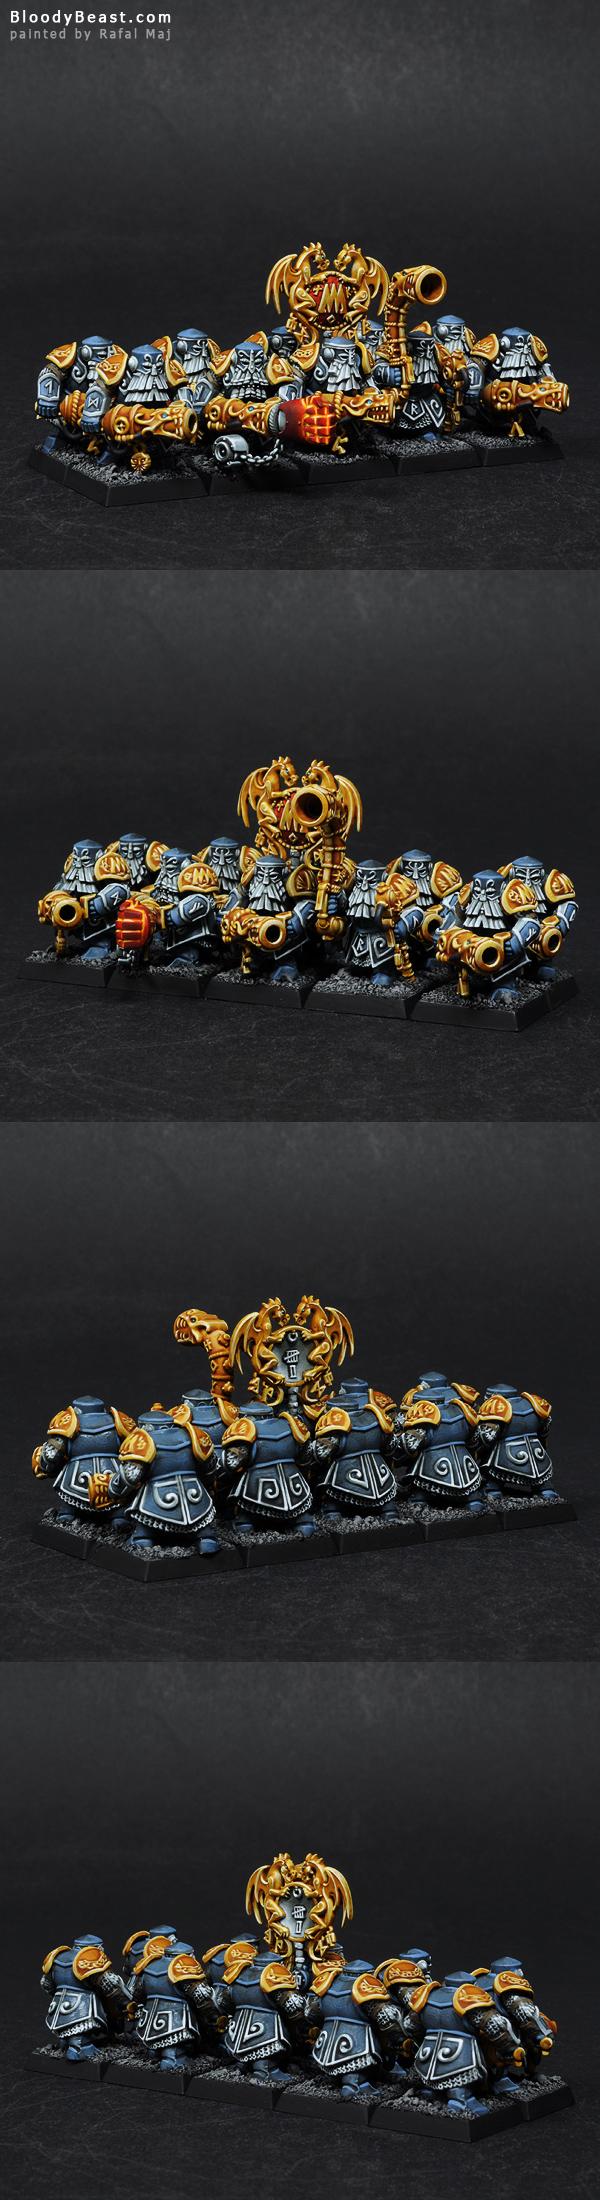 Dwarf Irondrakes painted by Rafal Maj (BloodyBeast.com)